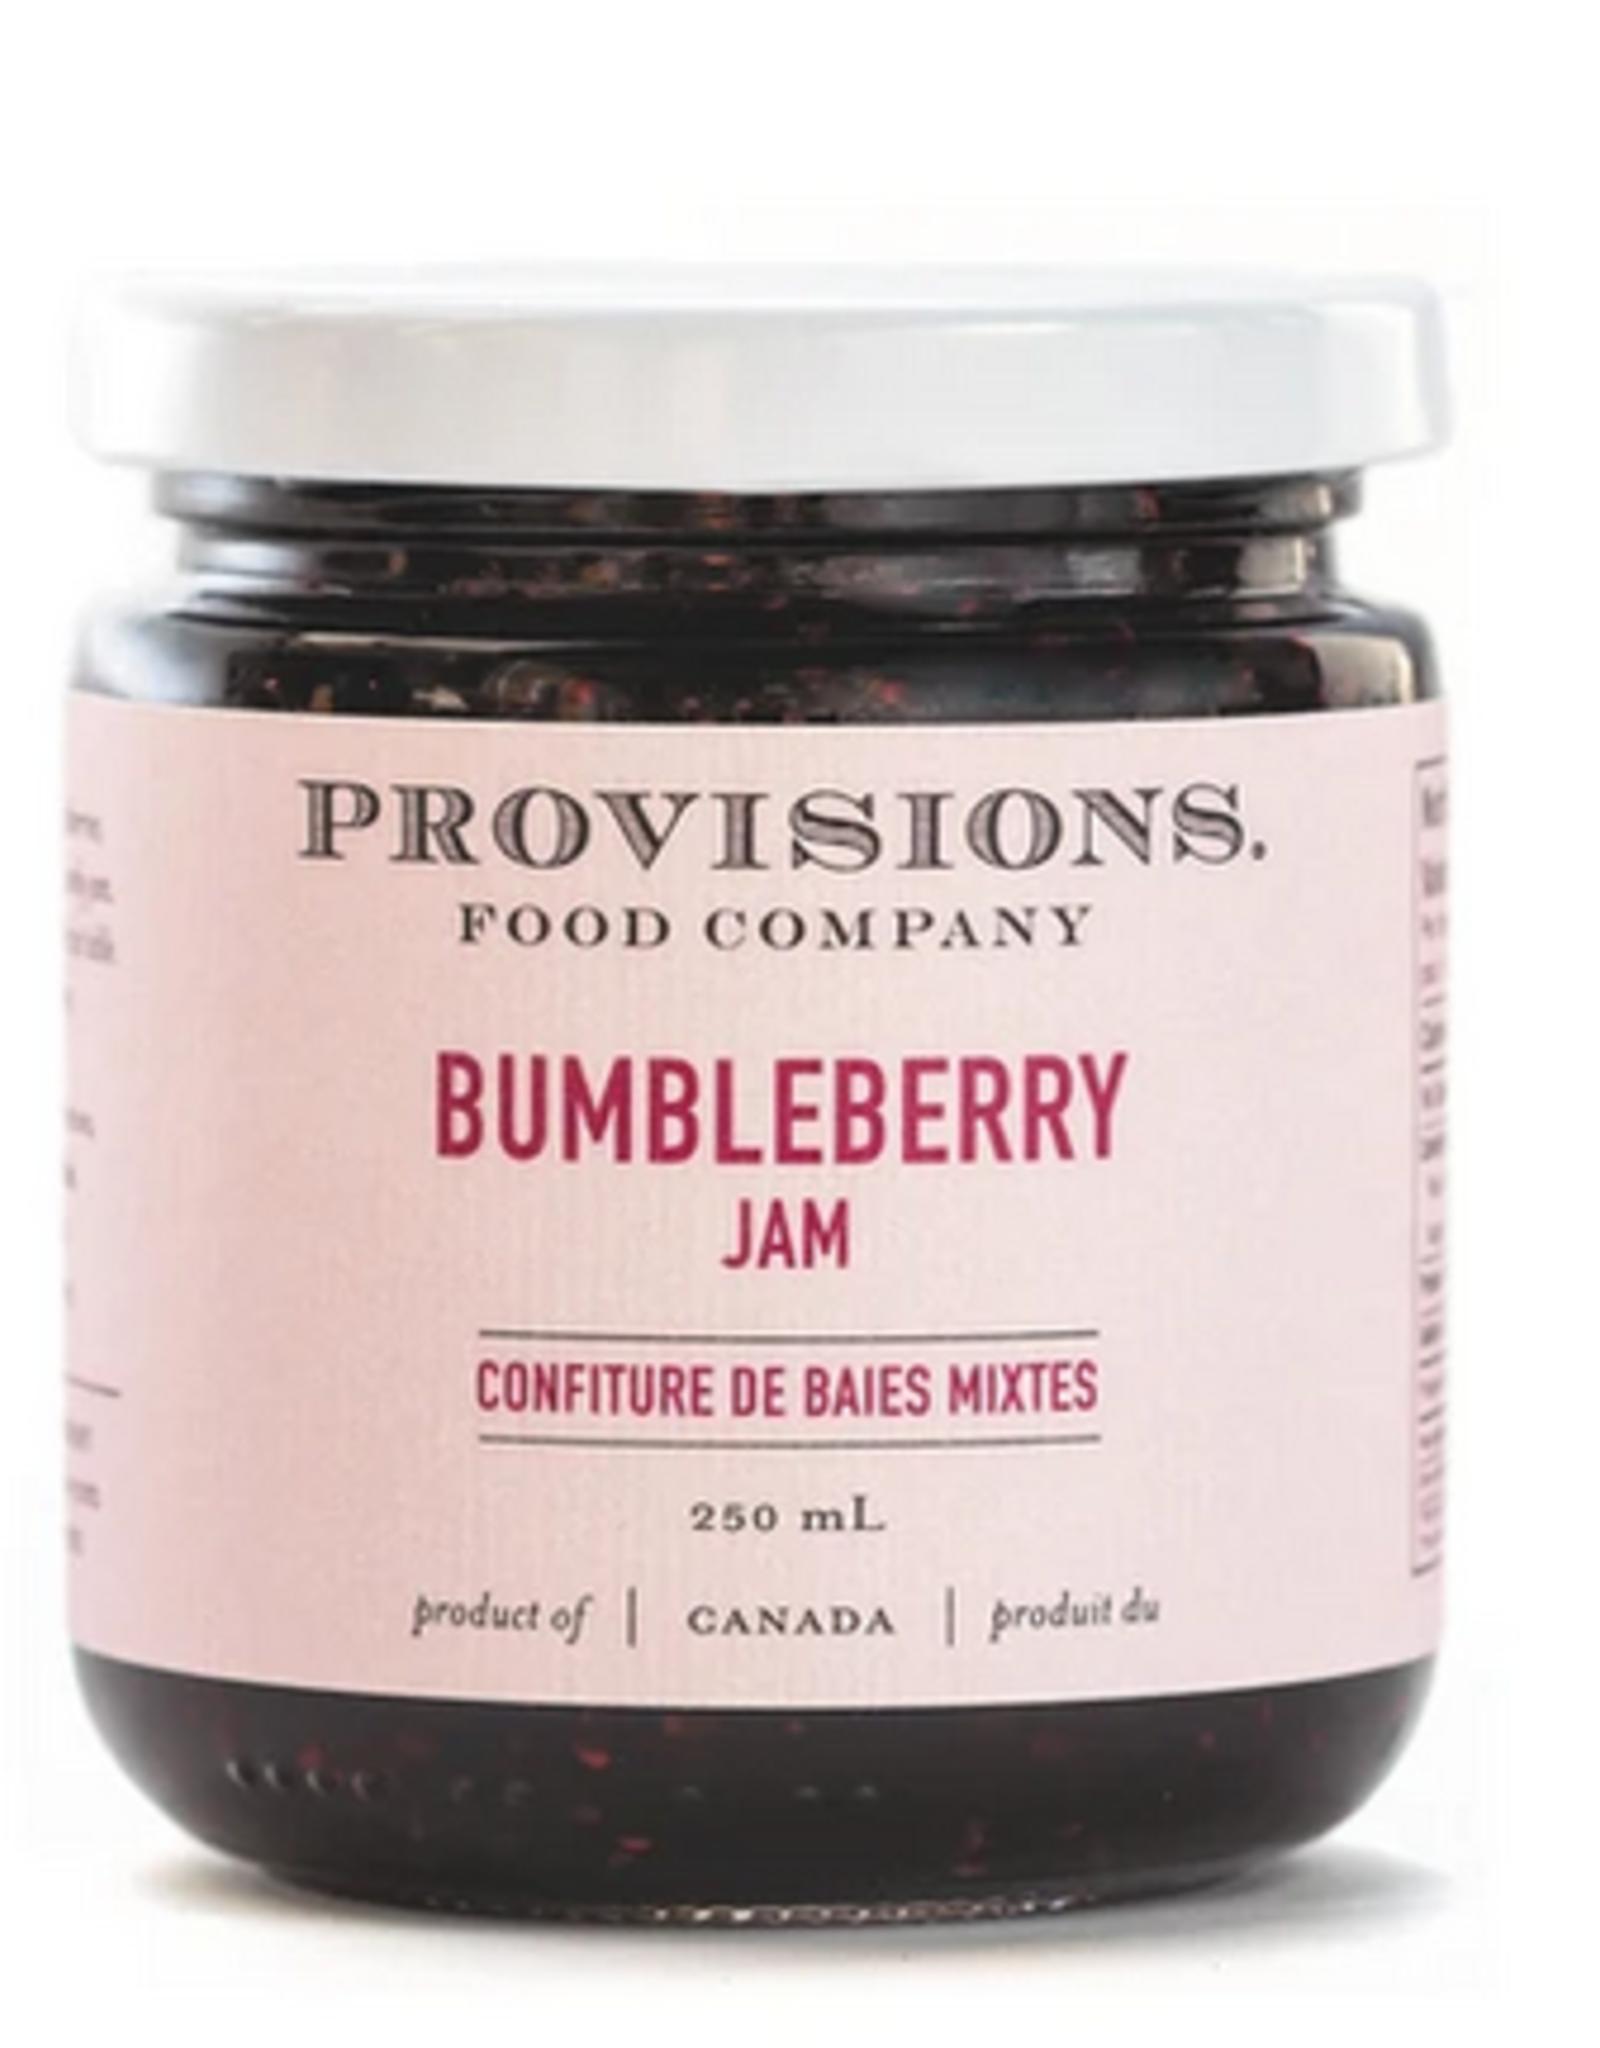 Provisions Bumbleberry Jam